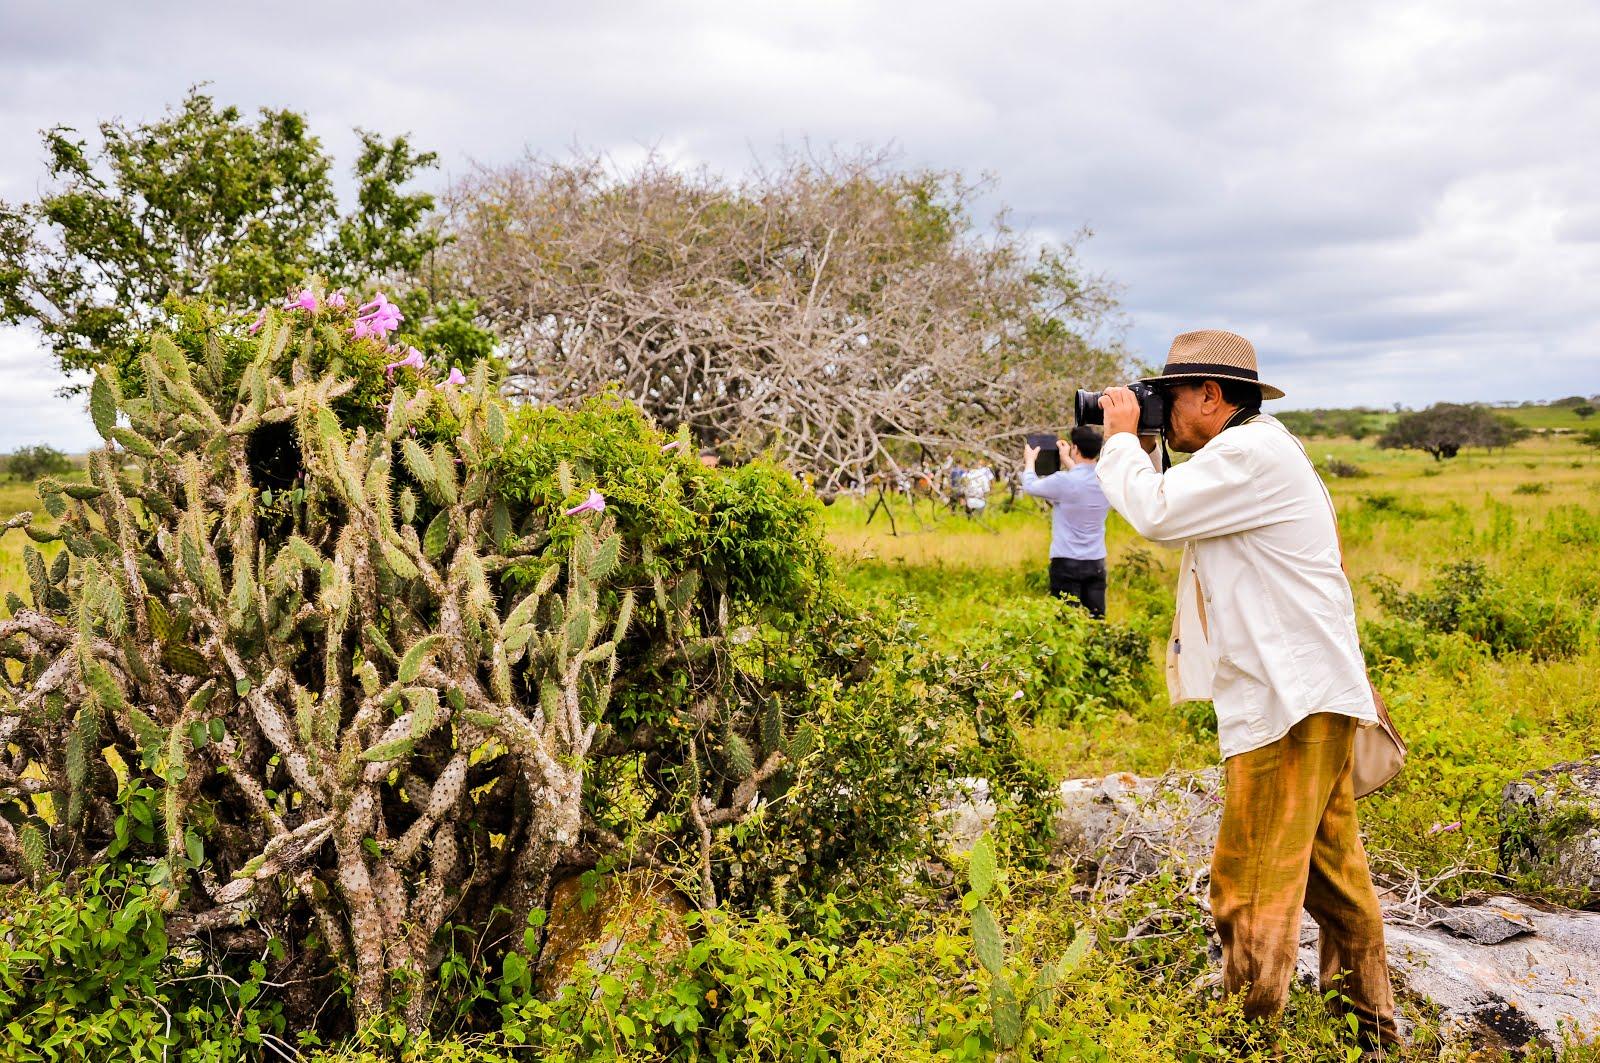 FOTOGRAFANDO NA FAZENDA MARANDUBA